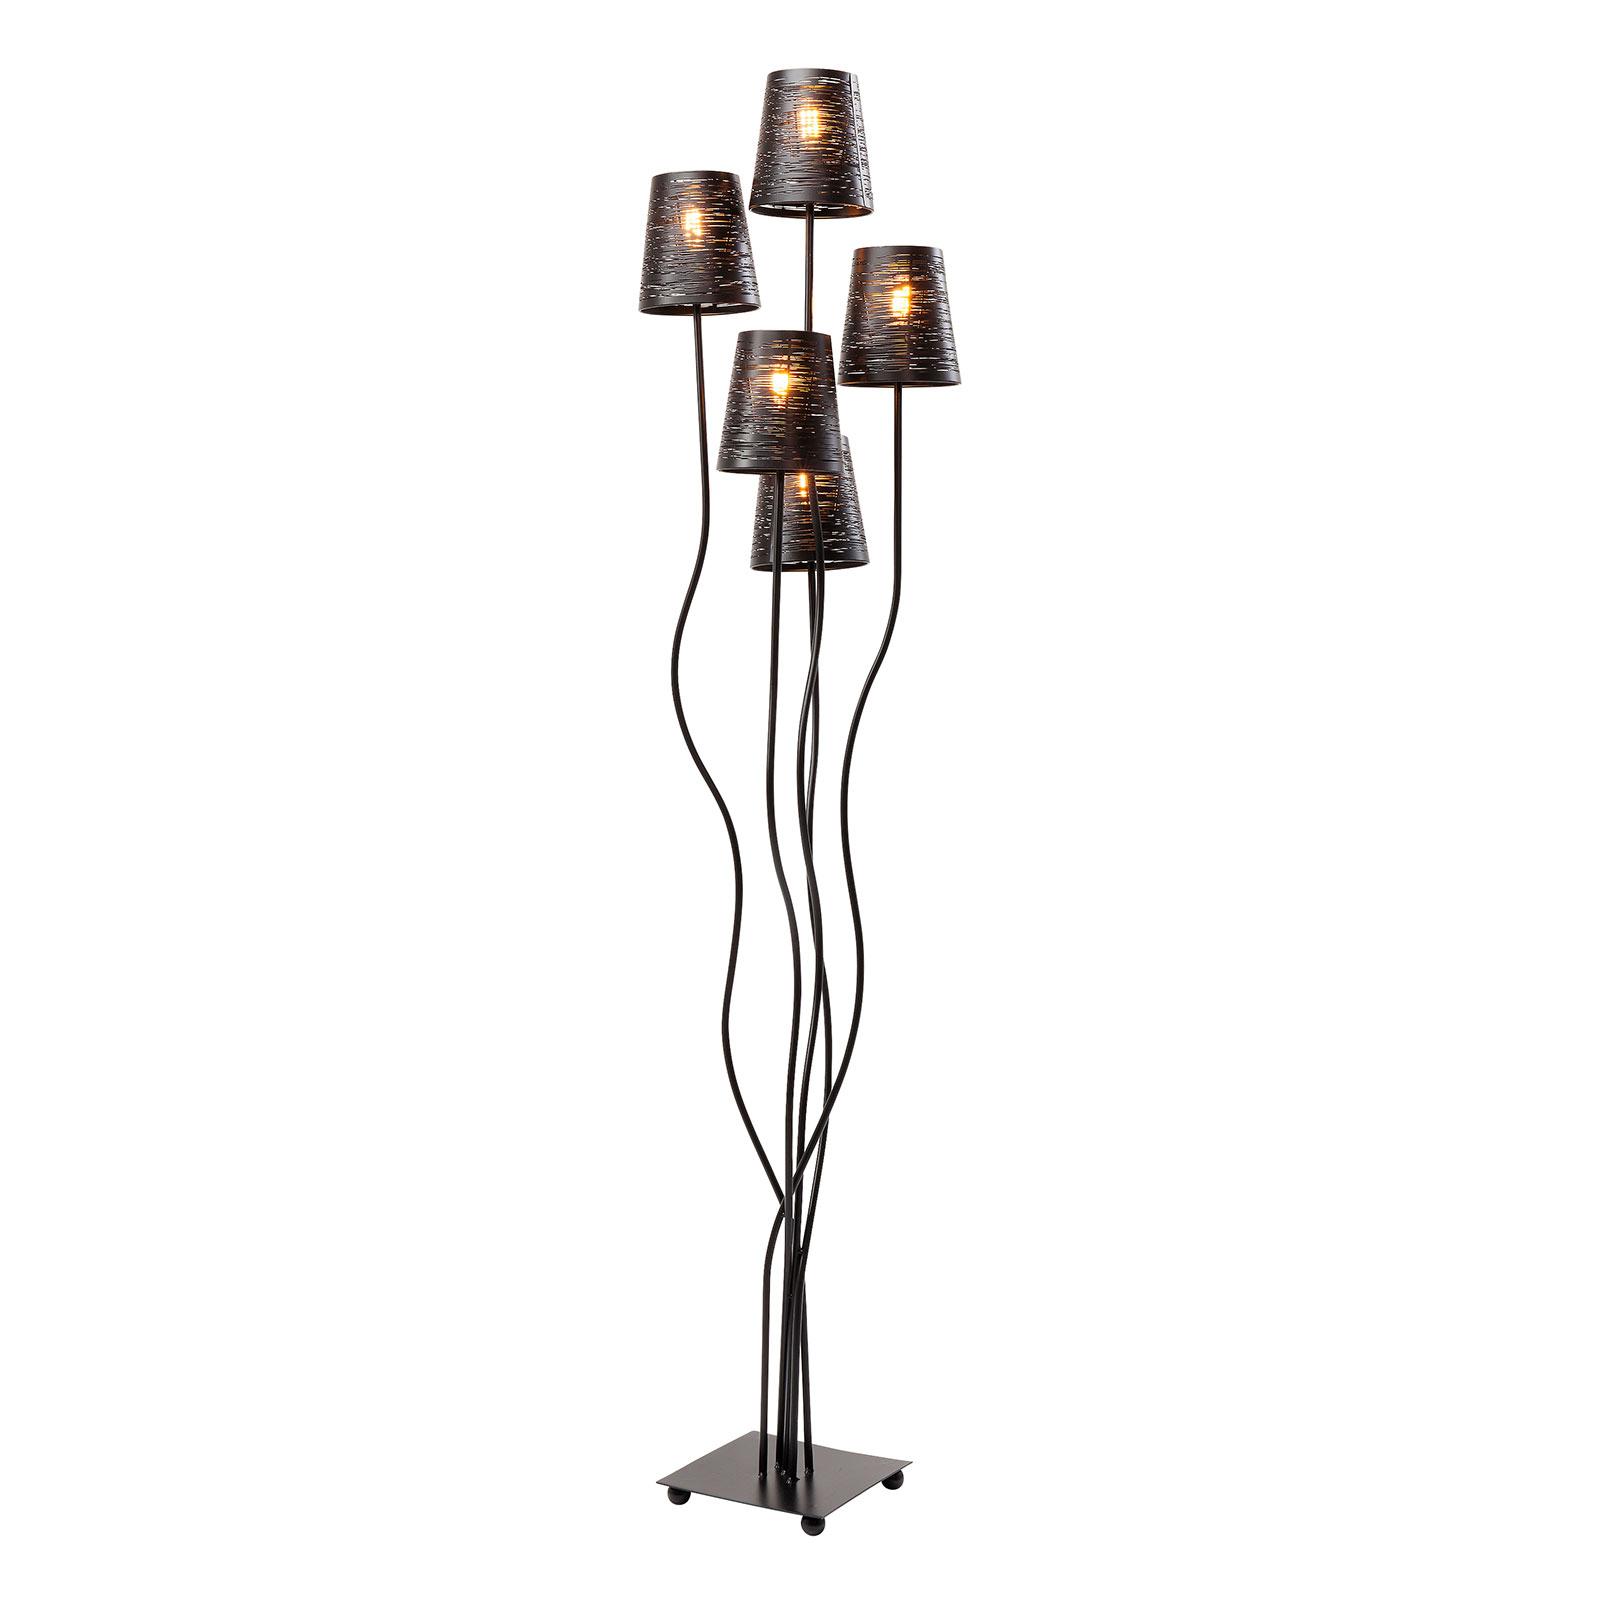 KARE Flexible standerlampe, 5 lyskilder, sort